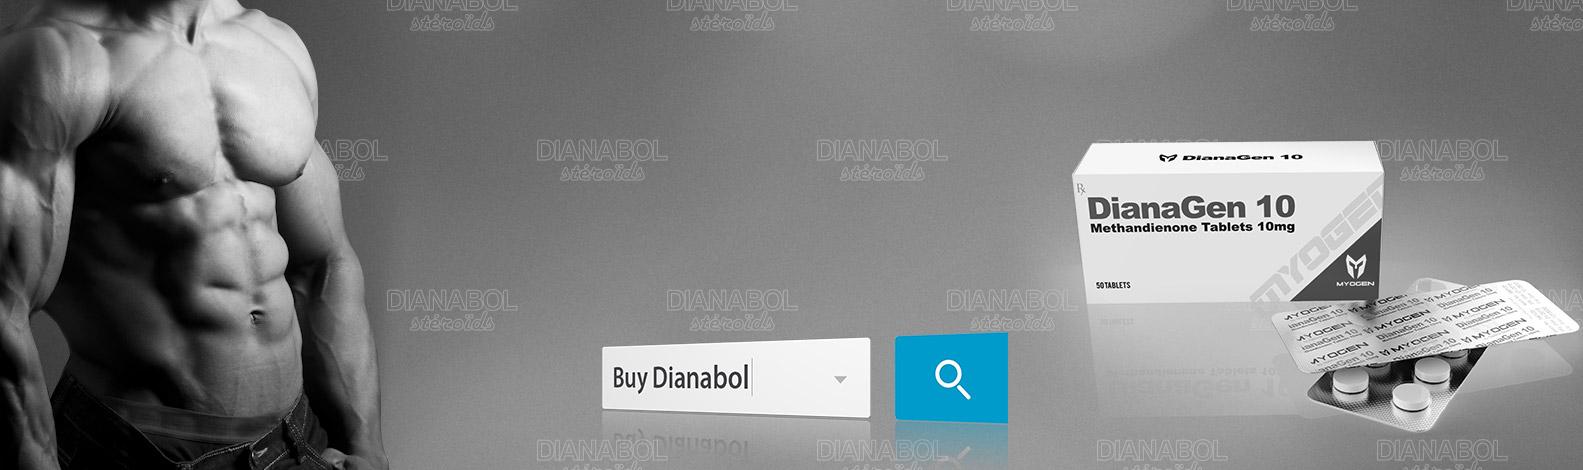 WPGHOMEWORKALO.X.FC2.COM - Is dianabol illegal in usa